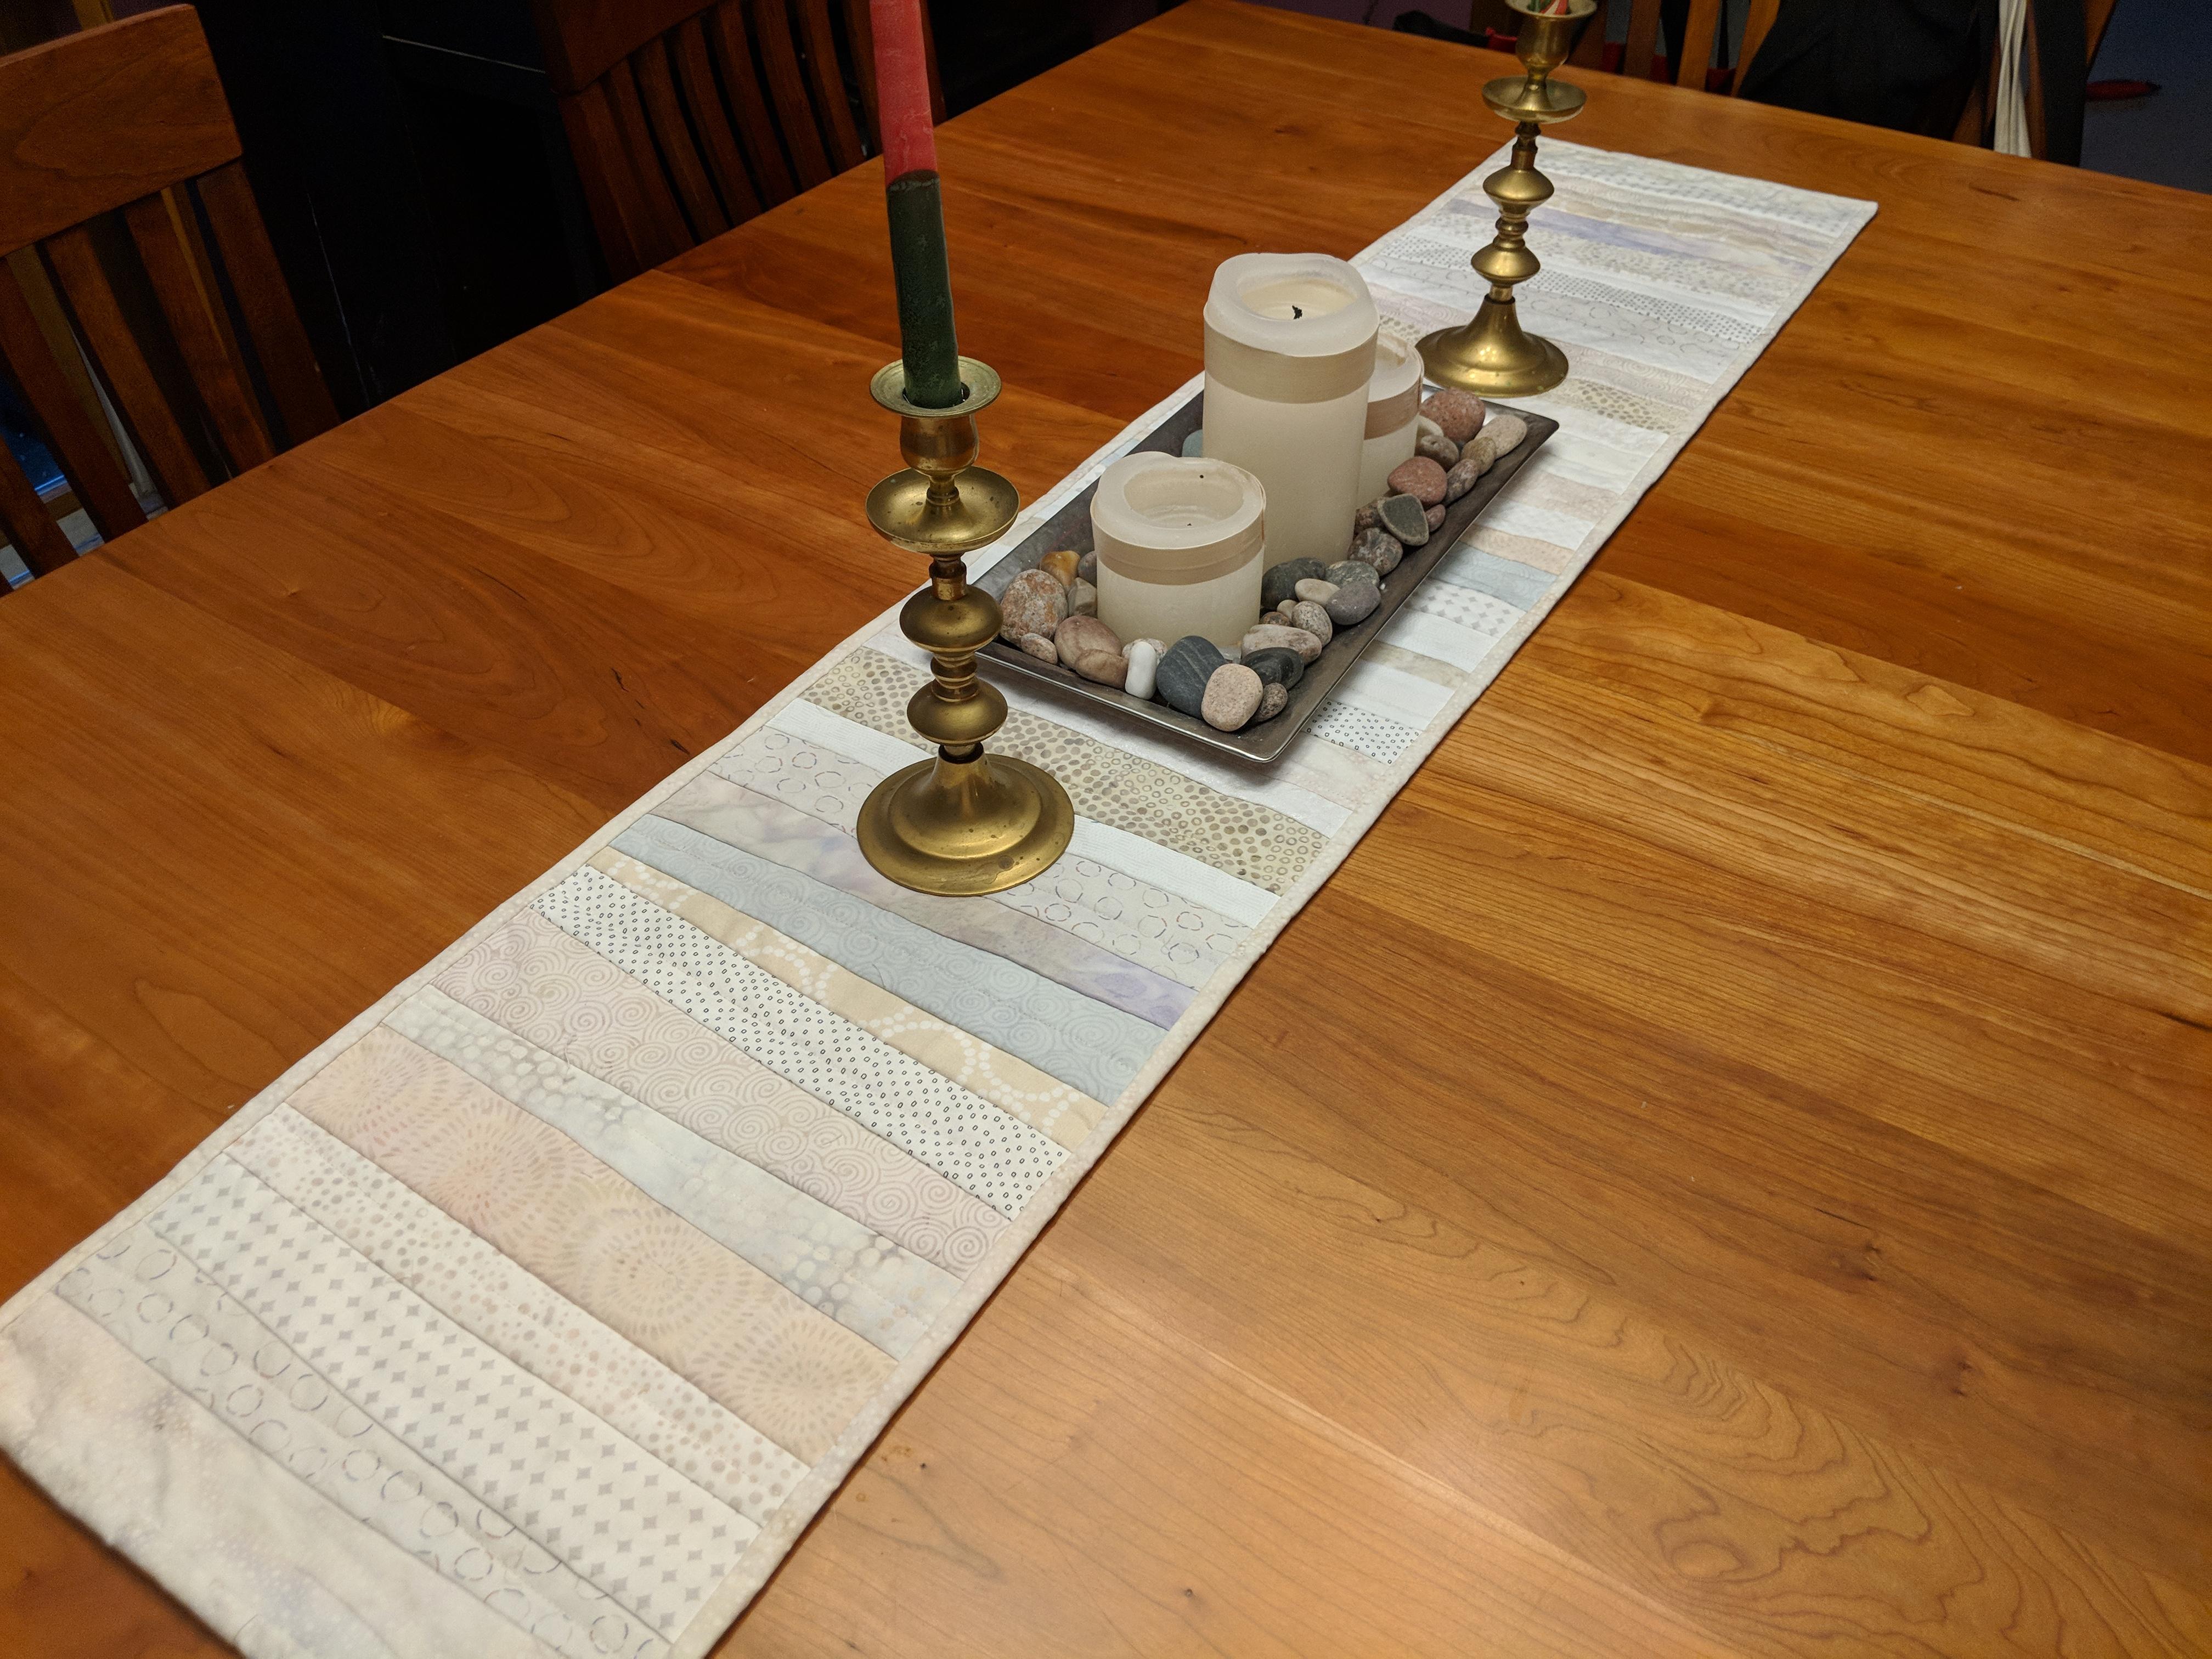 Table Runner in Neutrals